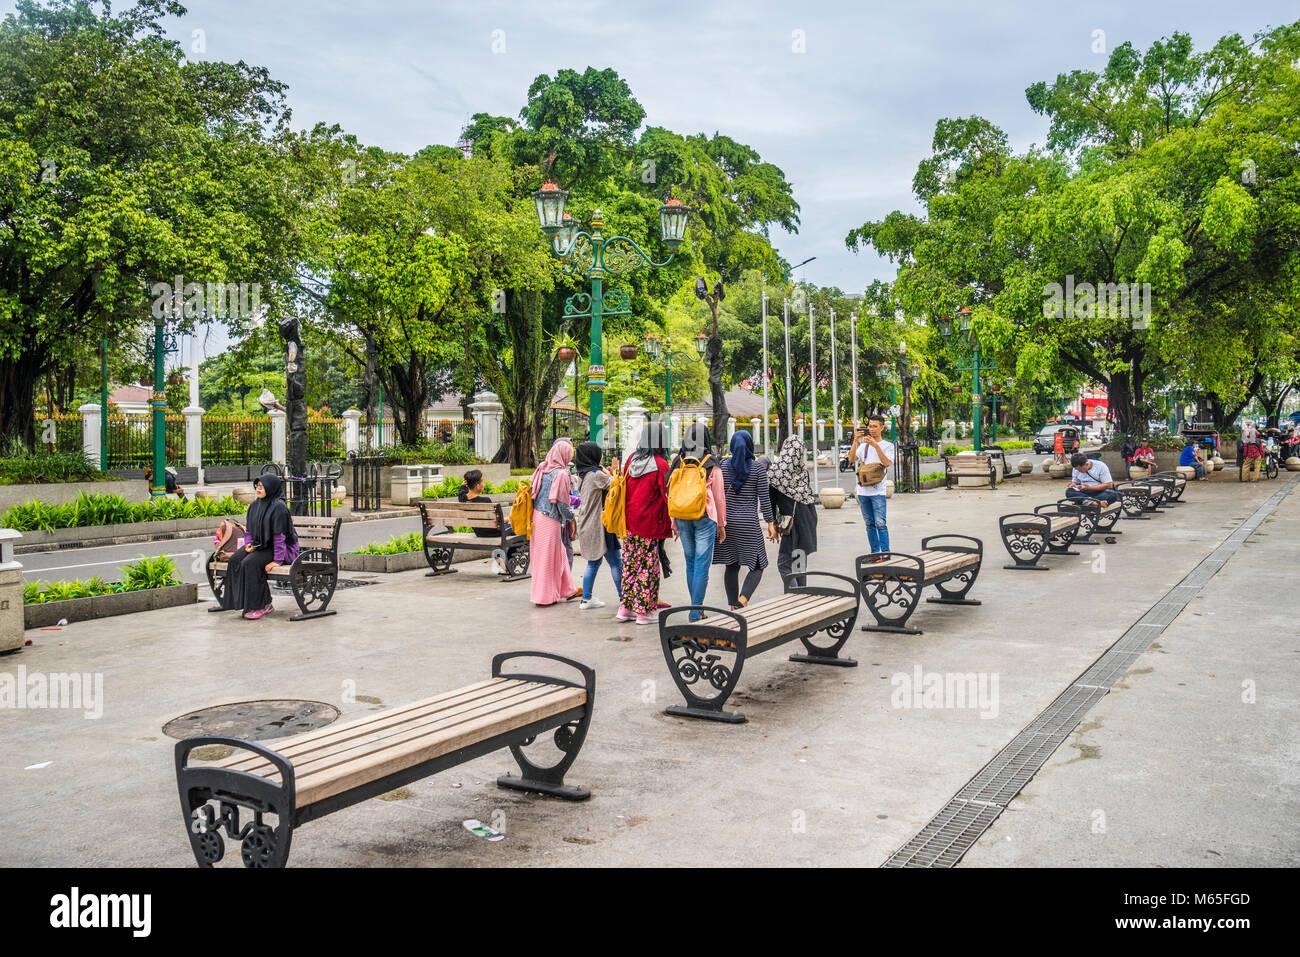 Indonesia, Central Java, Yogyakarta, Jalan Margo Mulyo near Kilometer Zero - Stock Image